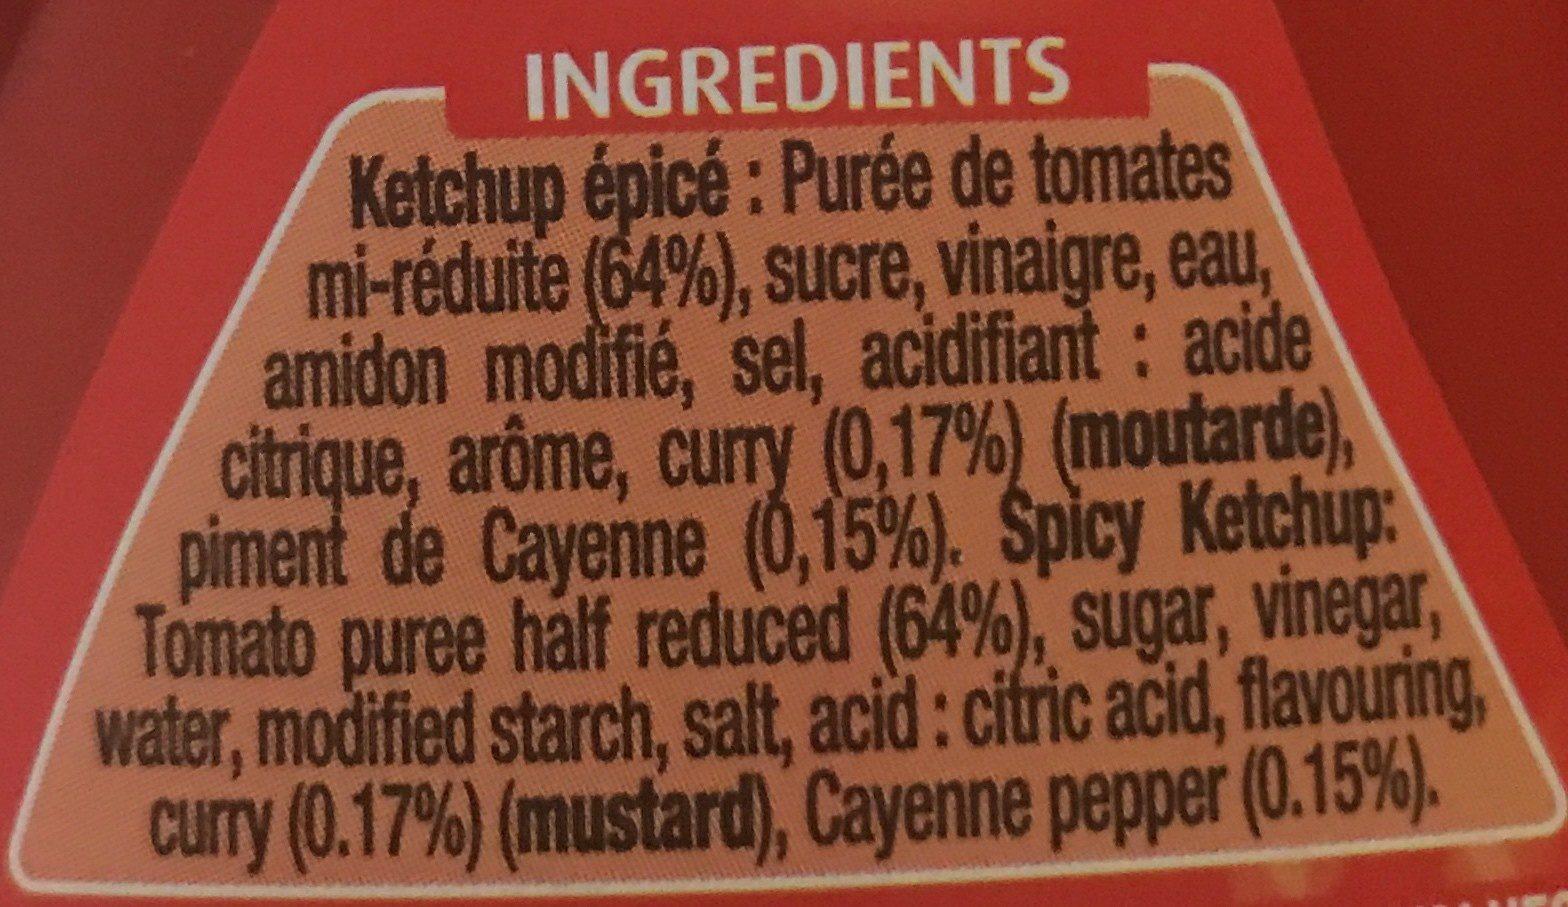 Hot & spicy Ketchup - Ingrédients